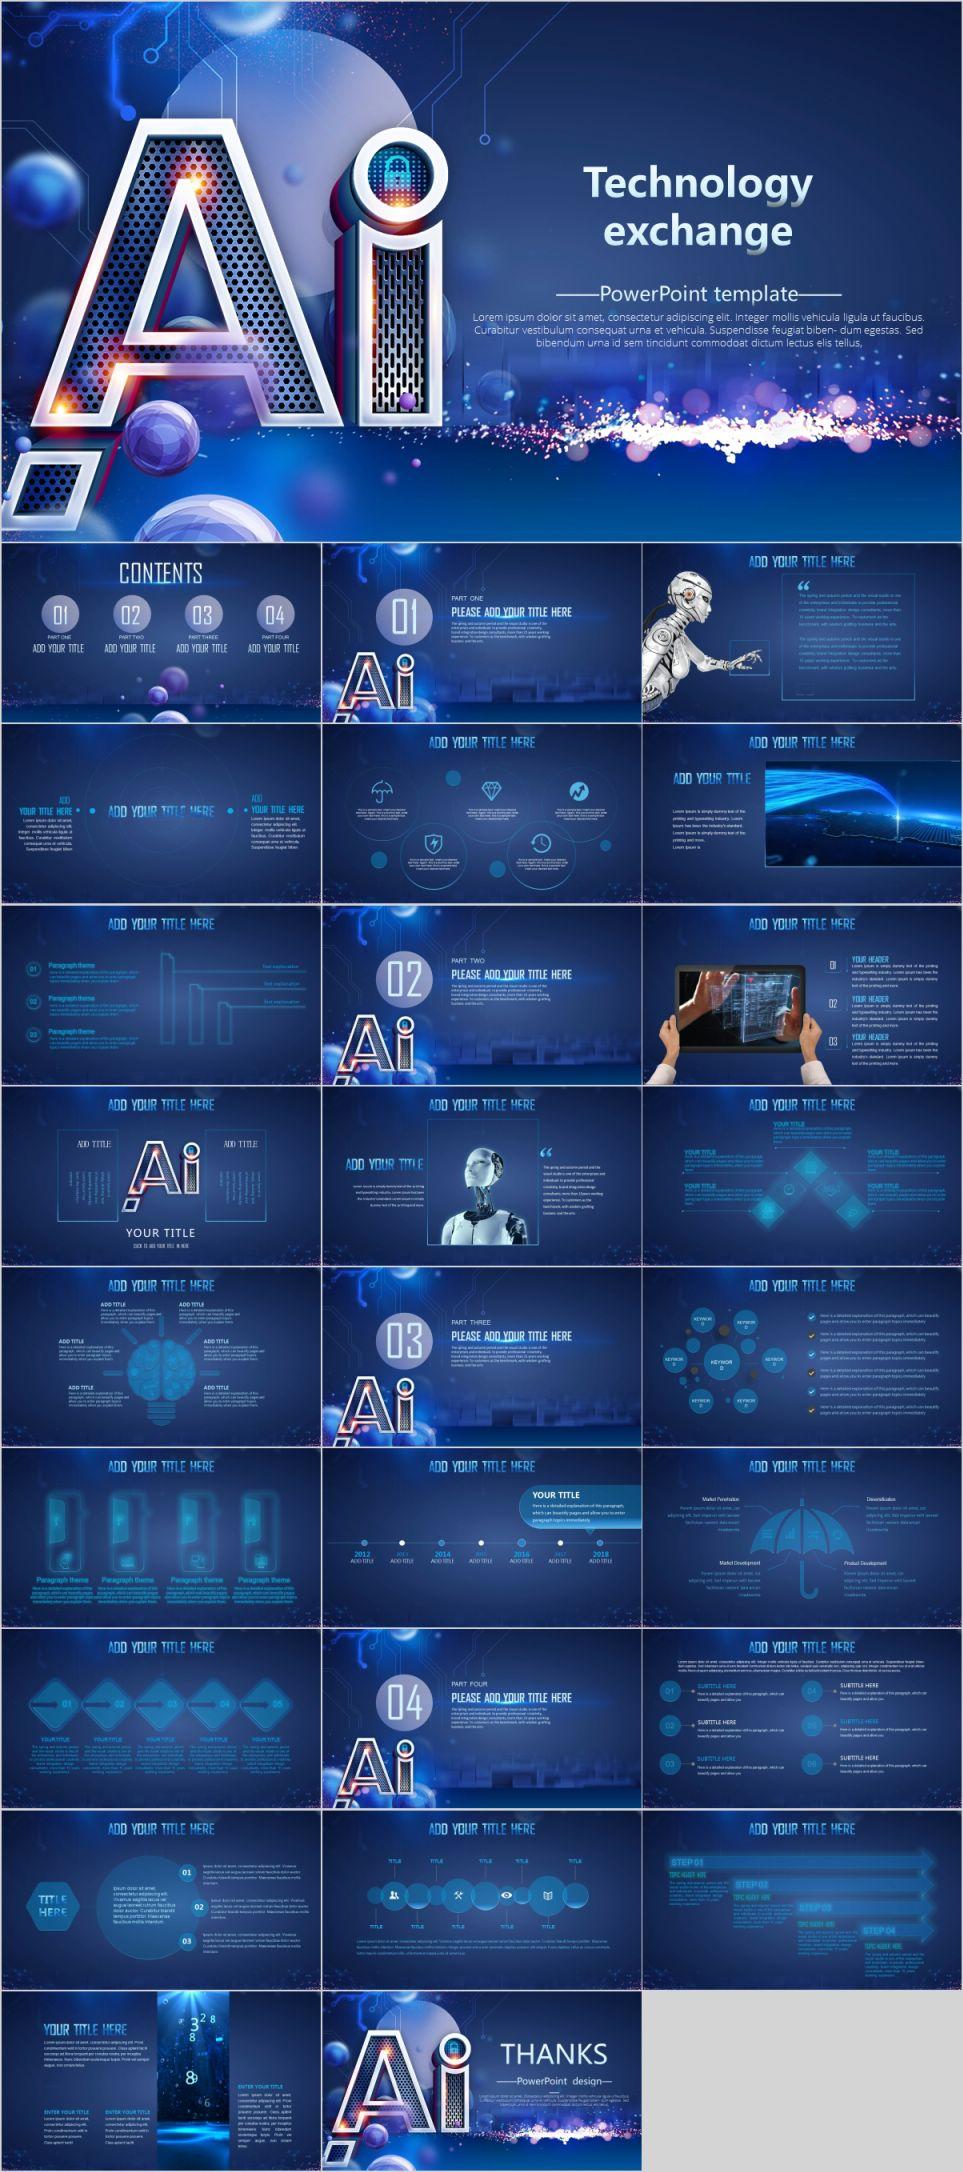 AI technology design presentation 배경 템플릿, 템플릿 및 아이디어